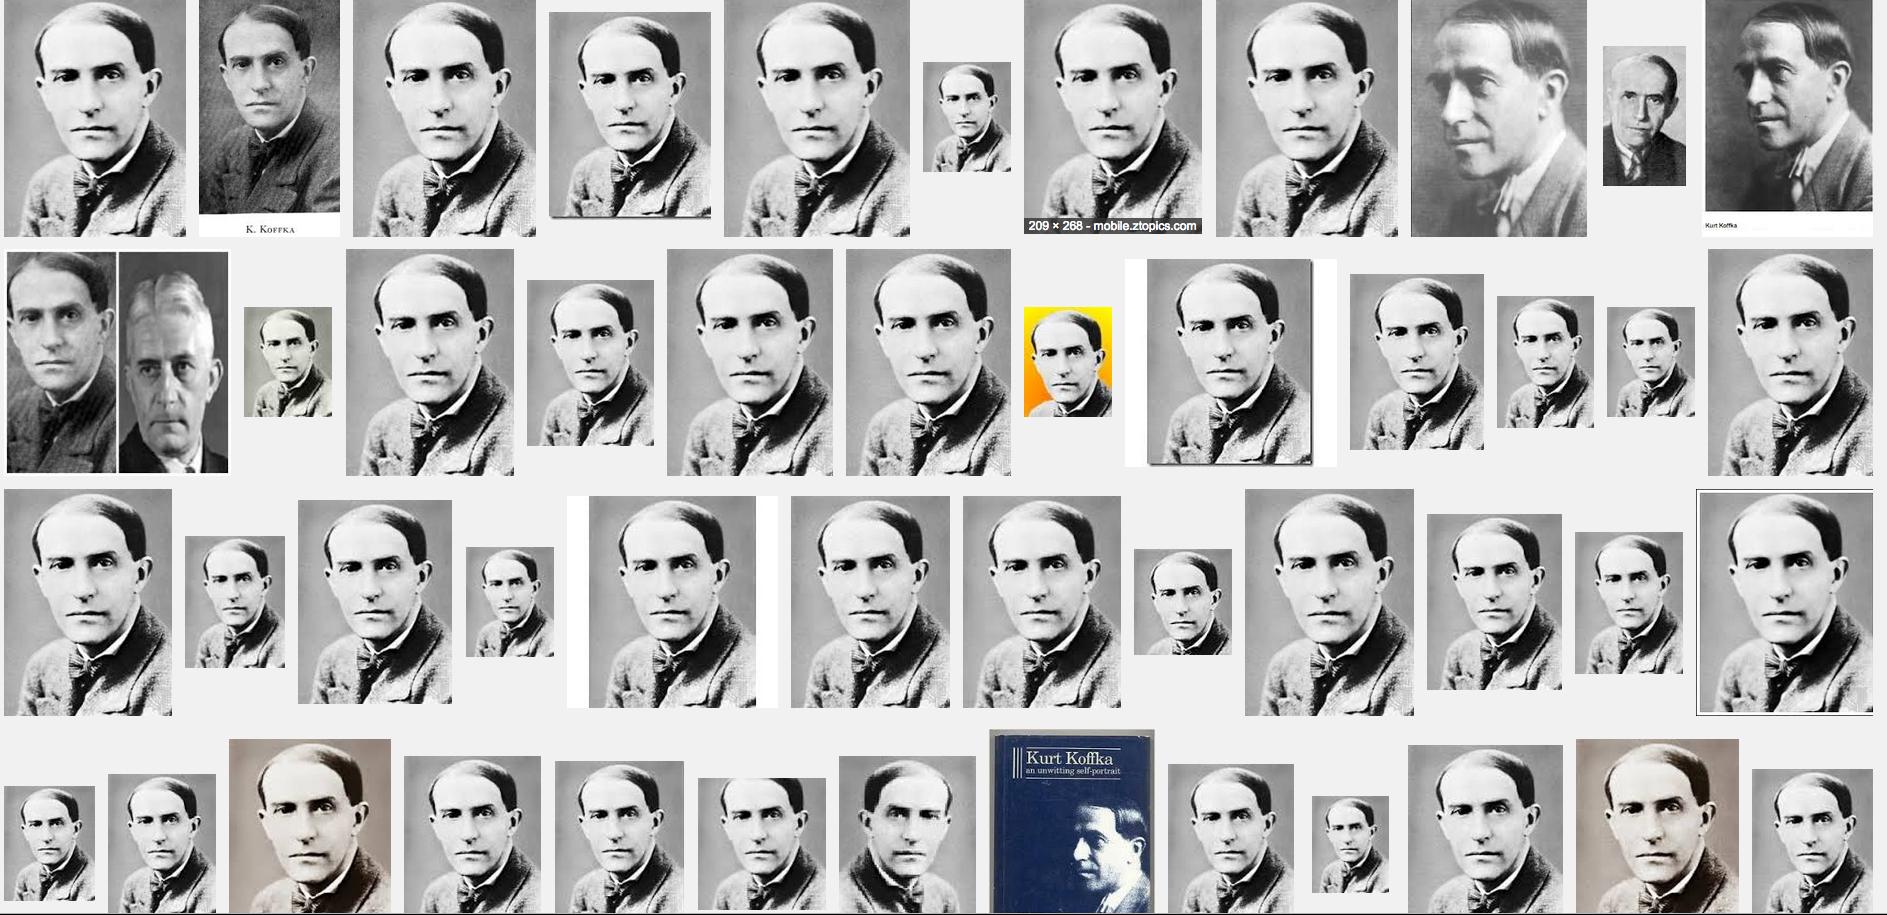 the life and works of wolfgang kohler a gestalt psychologist Gestalt psychology:wolfgang kohler, kurt koffka, edward de bono history and systems of psychology social sciences psychology.